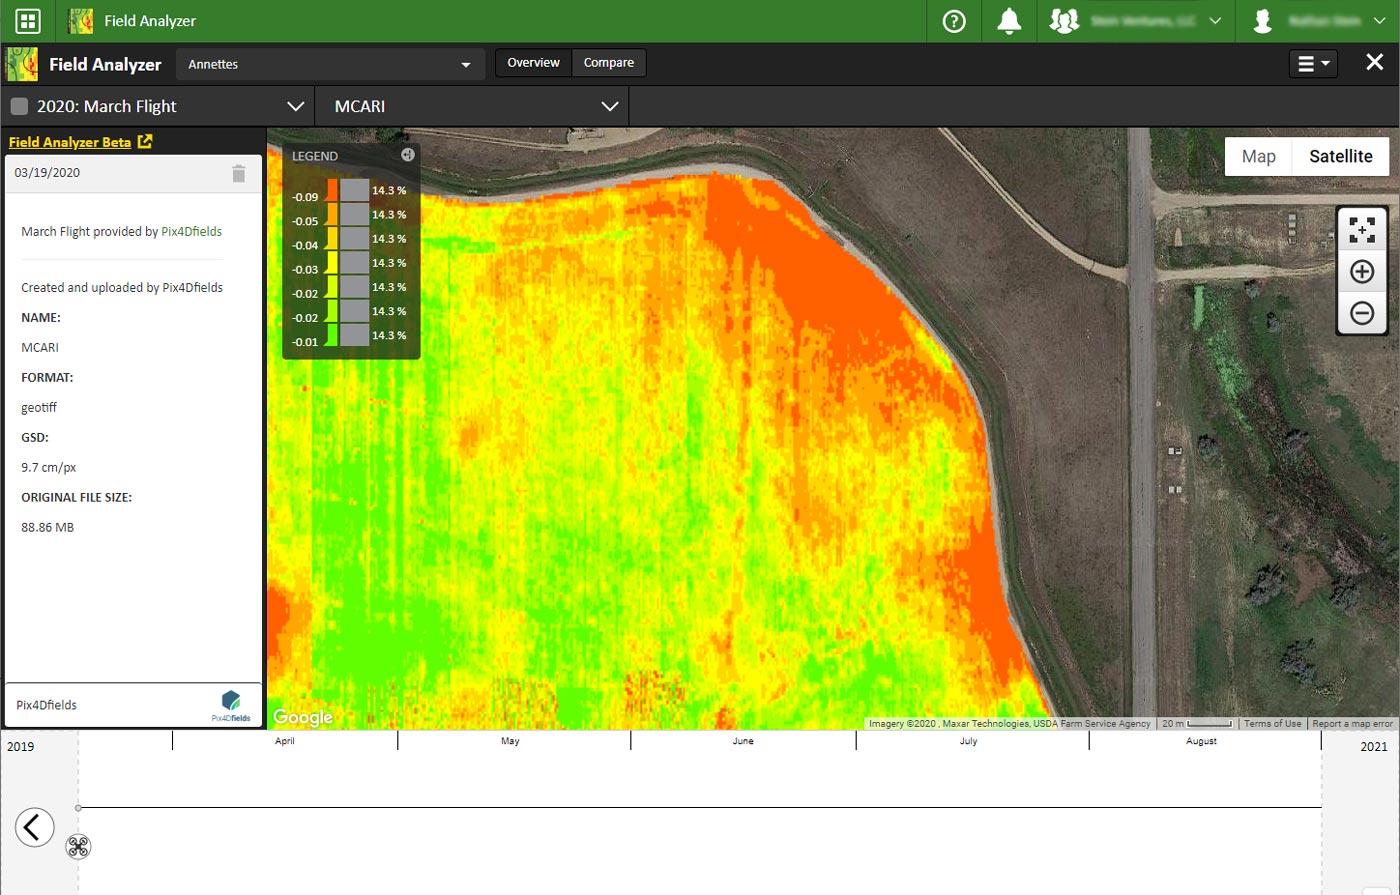 John Deere Field Analyzer Pix4Dfields index map